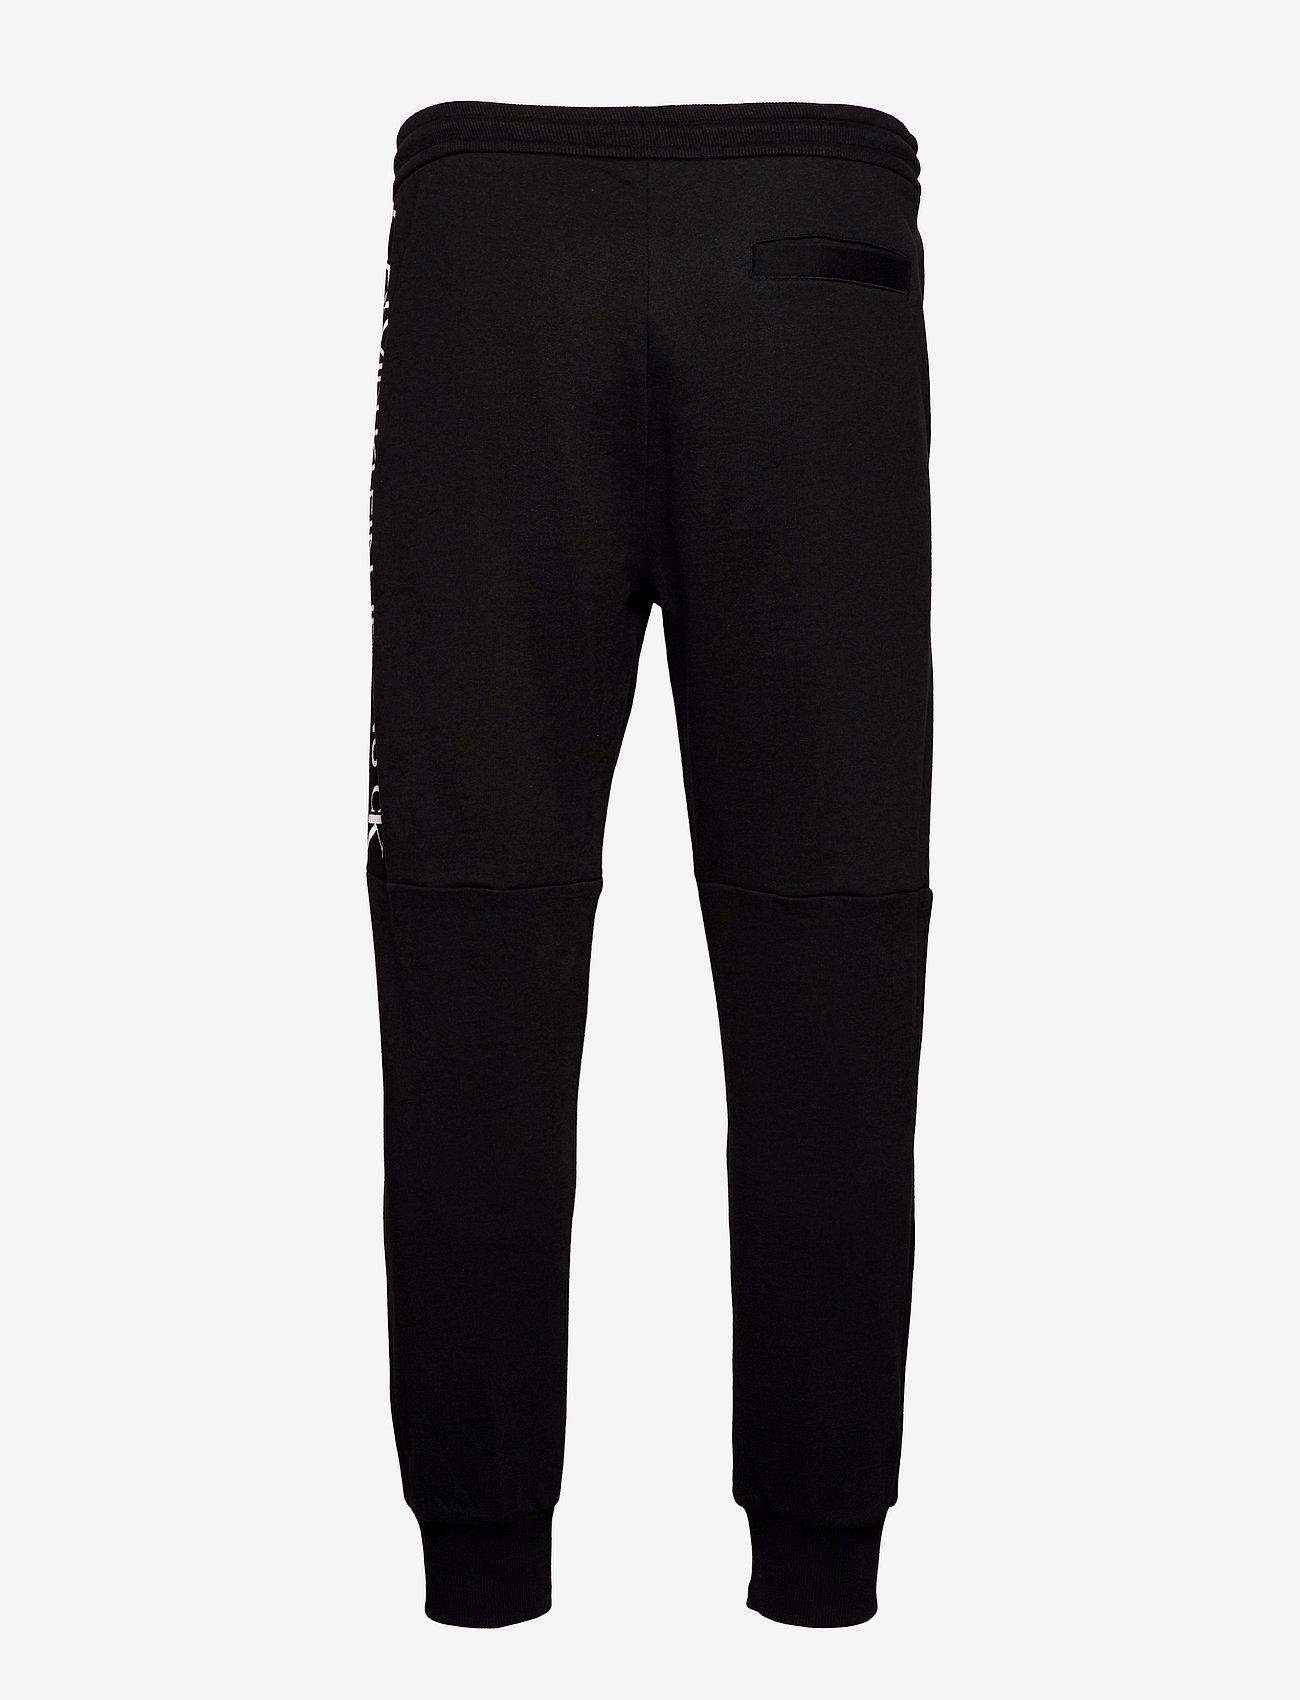 Calvin Klein Jeans - MIRROR LOGO HWK PANT - kleding - ck black - 1